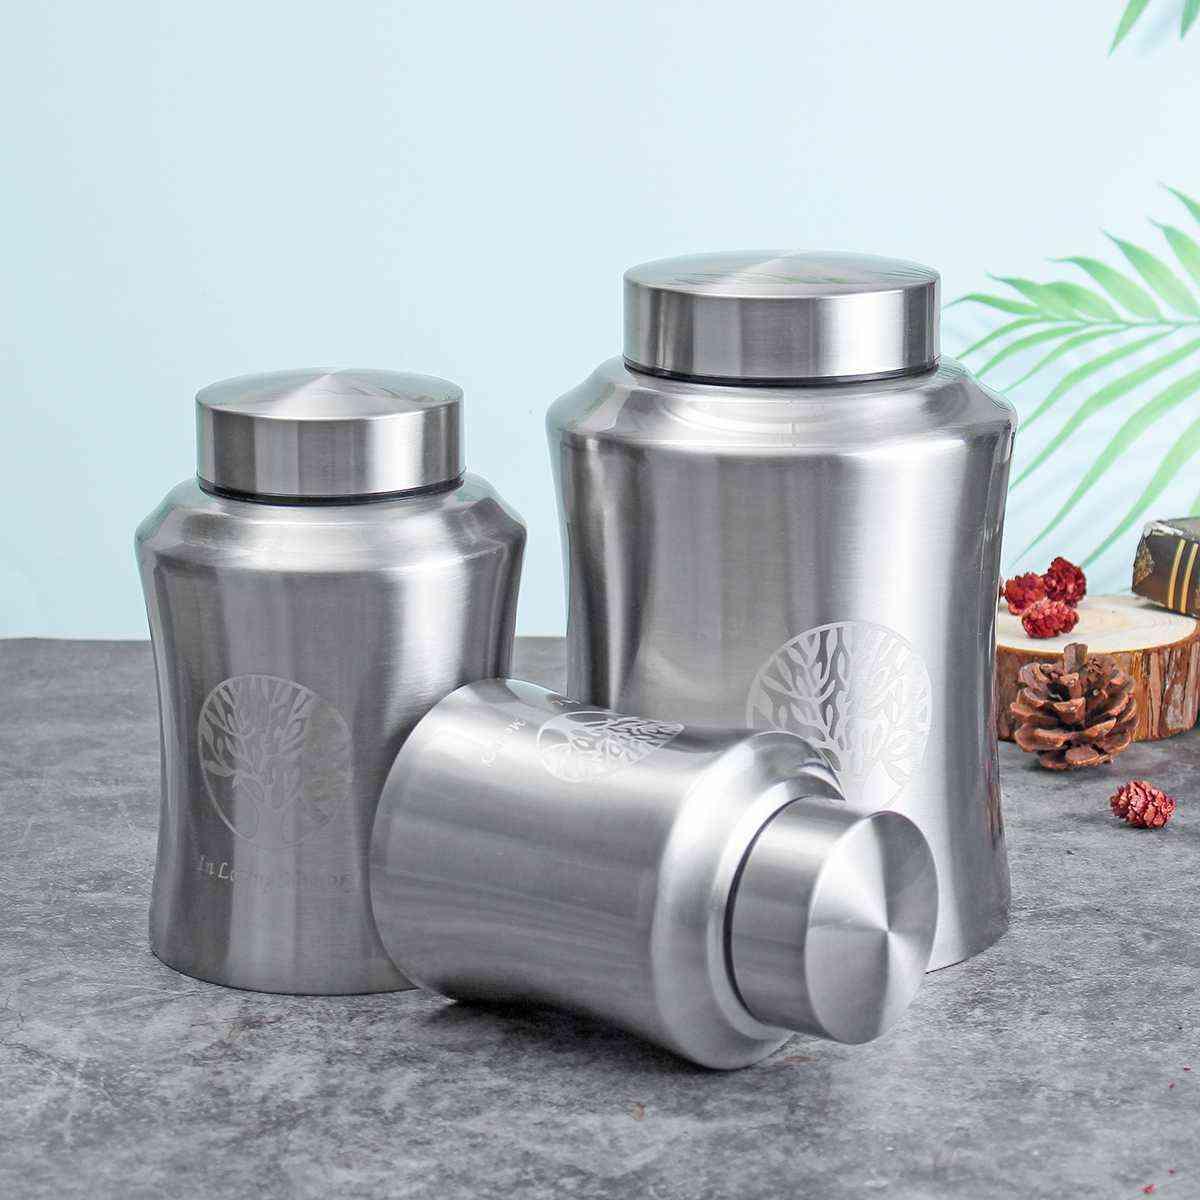 Pet Memorial Cremation Mini Urns - Funeral Stainless Steel Cremation Jar Storage Tank